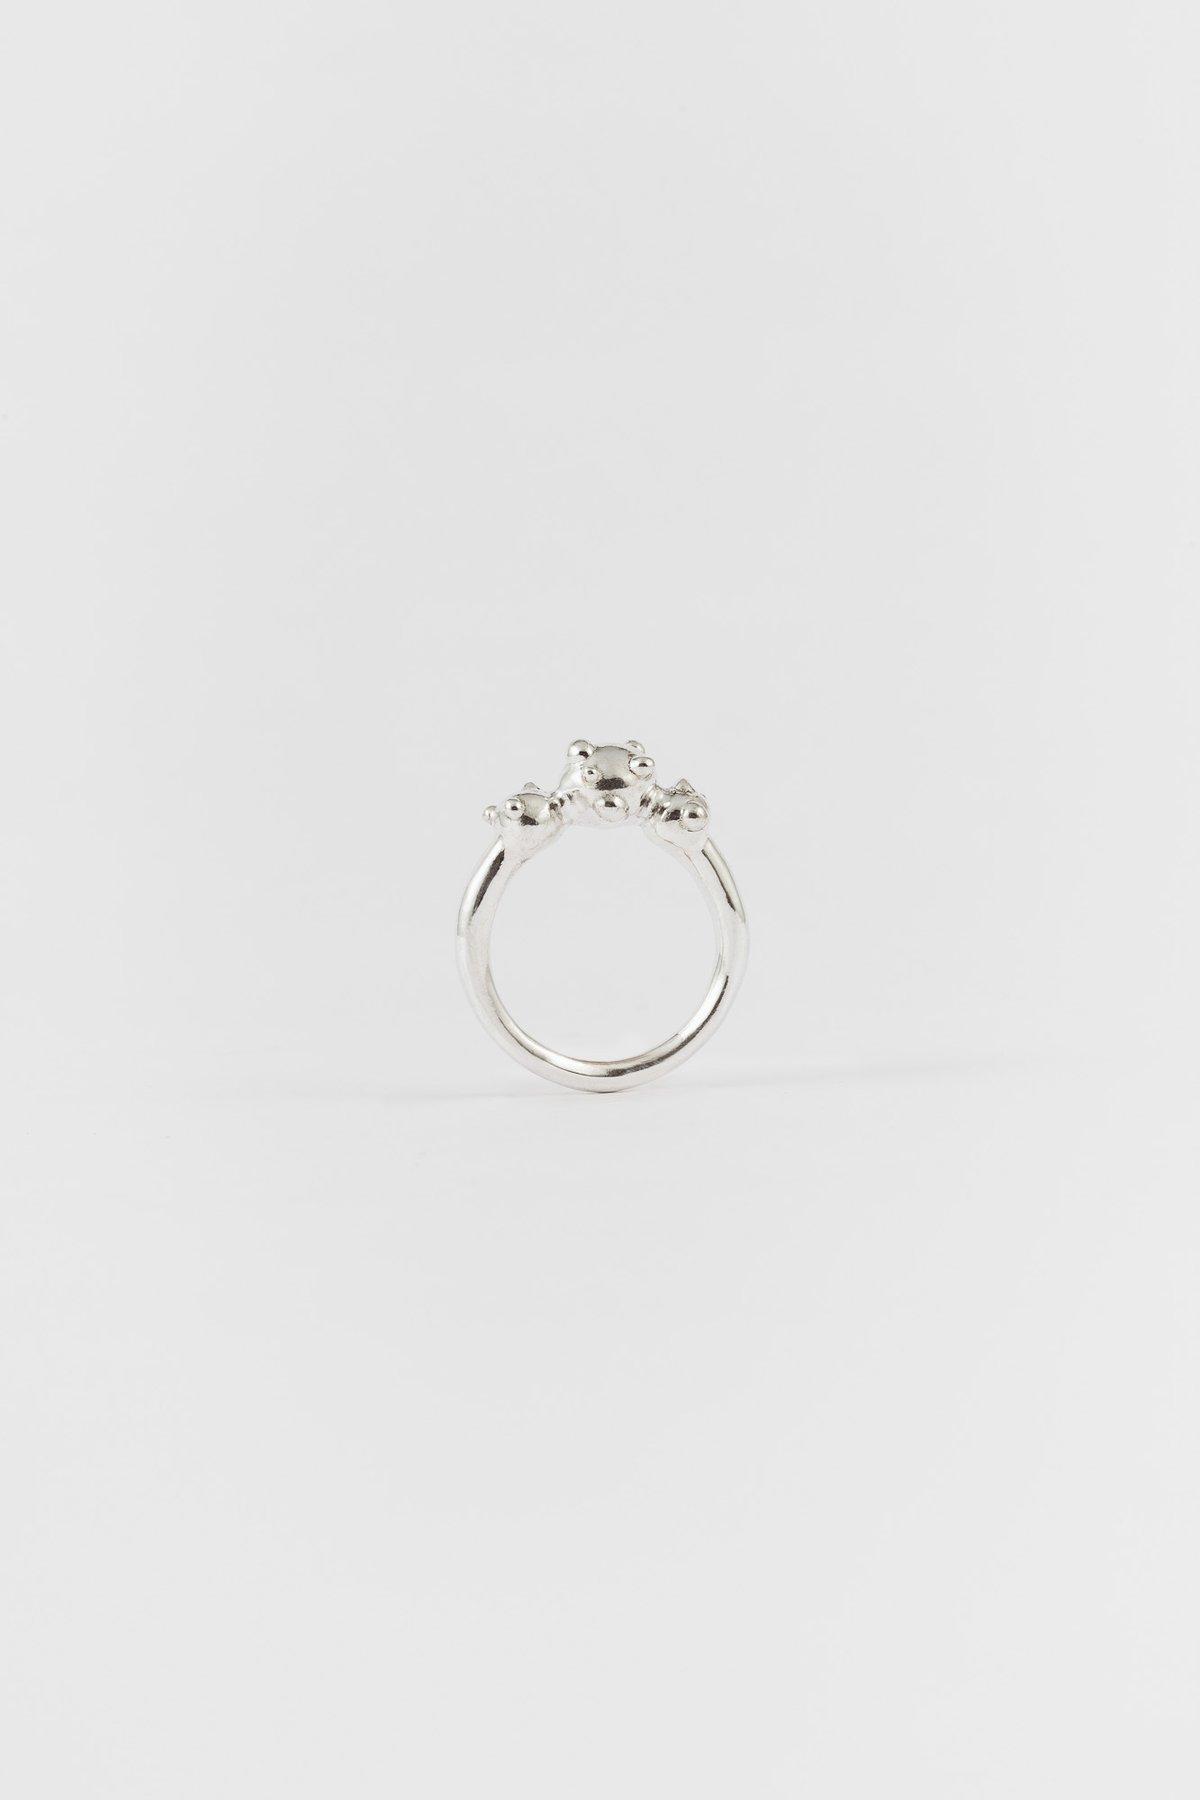 Image of helia ring